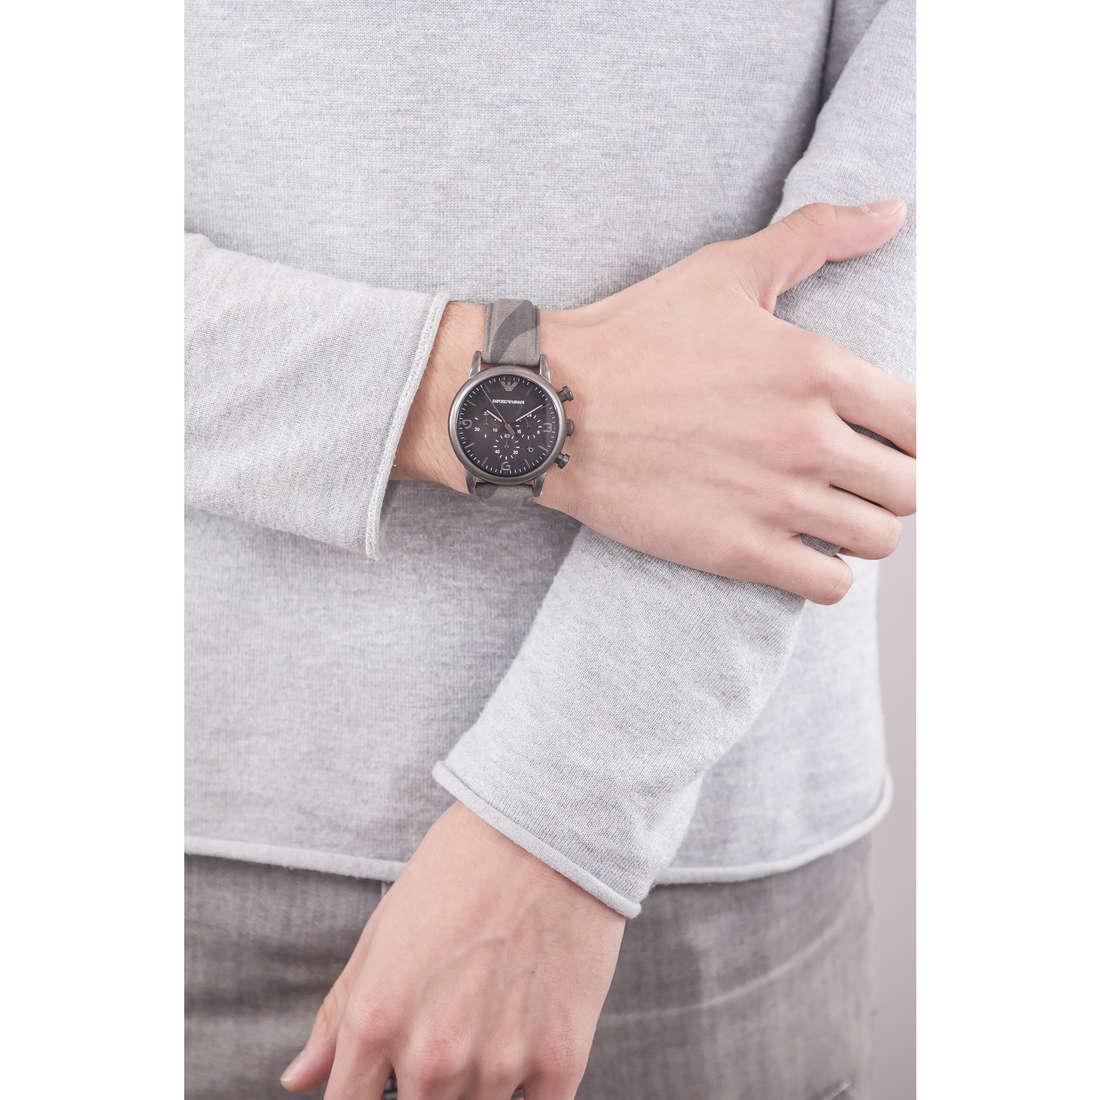 Emporio Armani cronografi uomo AR1817 indosso